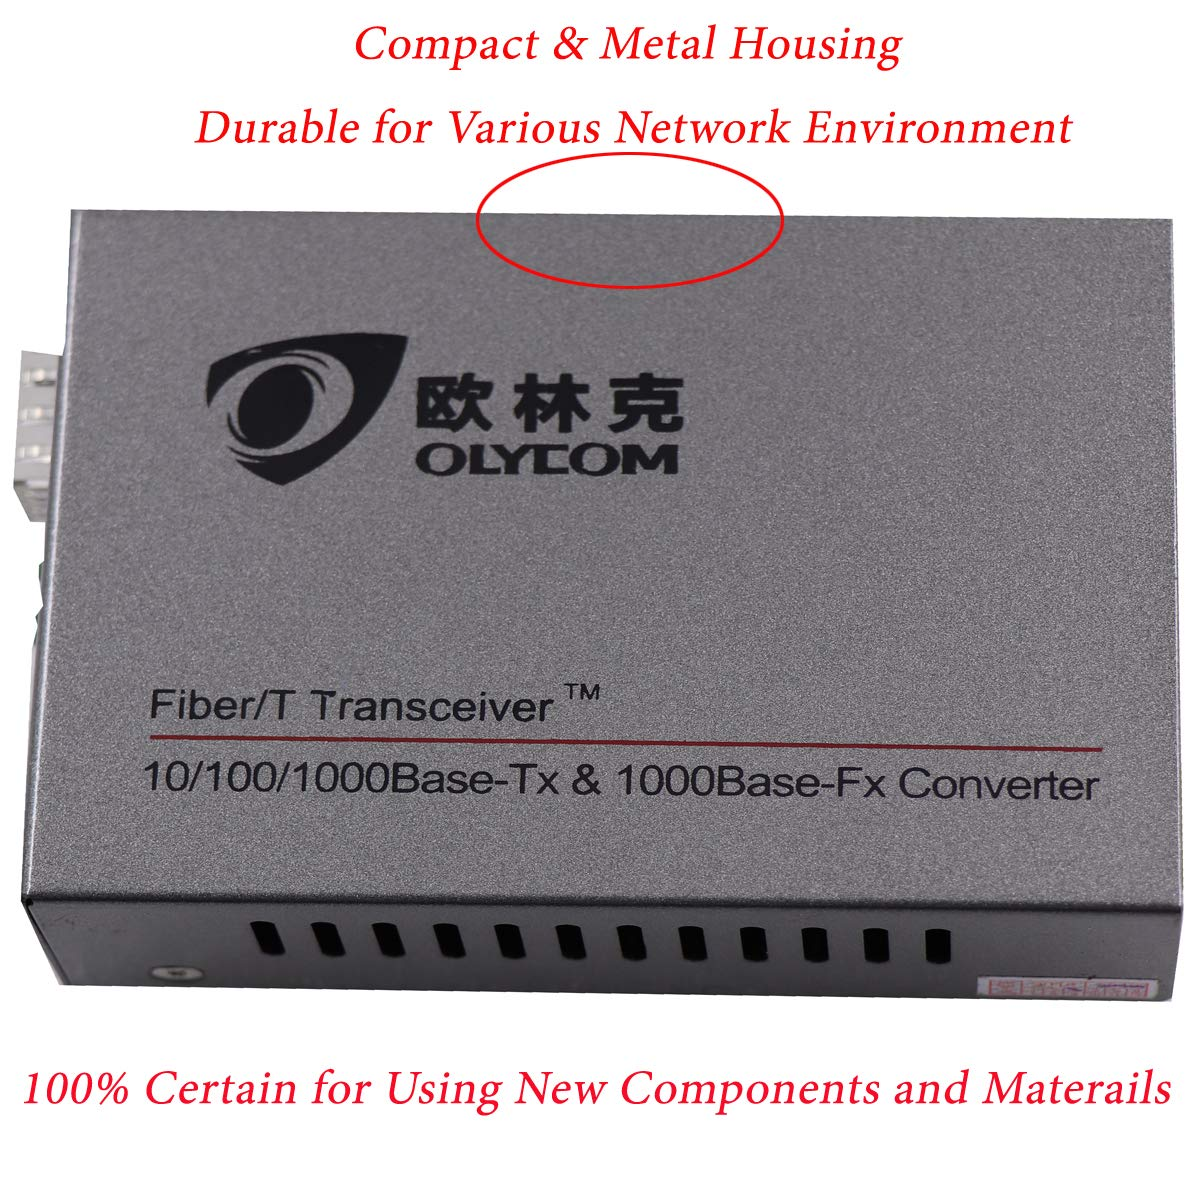 with 1.25Gb SFP Module. OLYCOM Gigabit Ethernet Media Converter Dual Fiber To Network Optical Transceiver,20Km